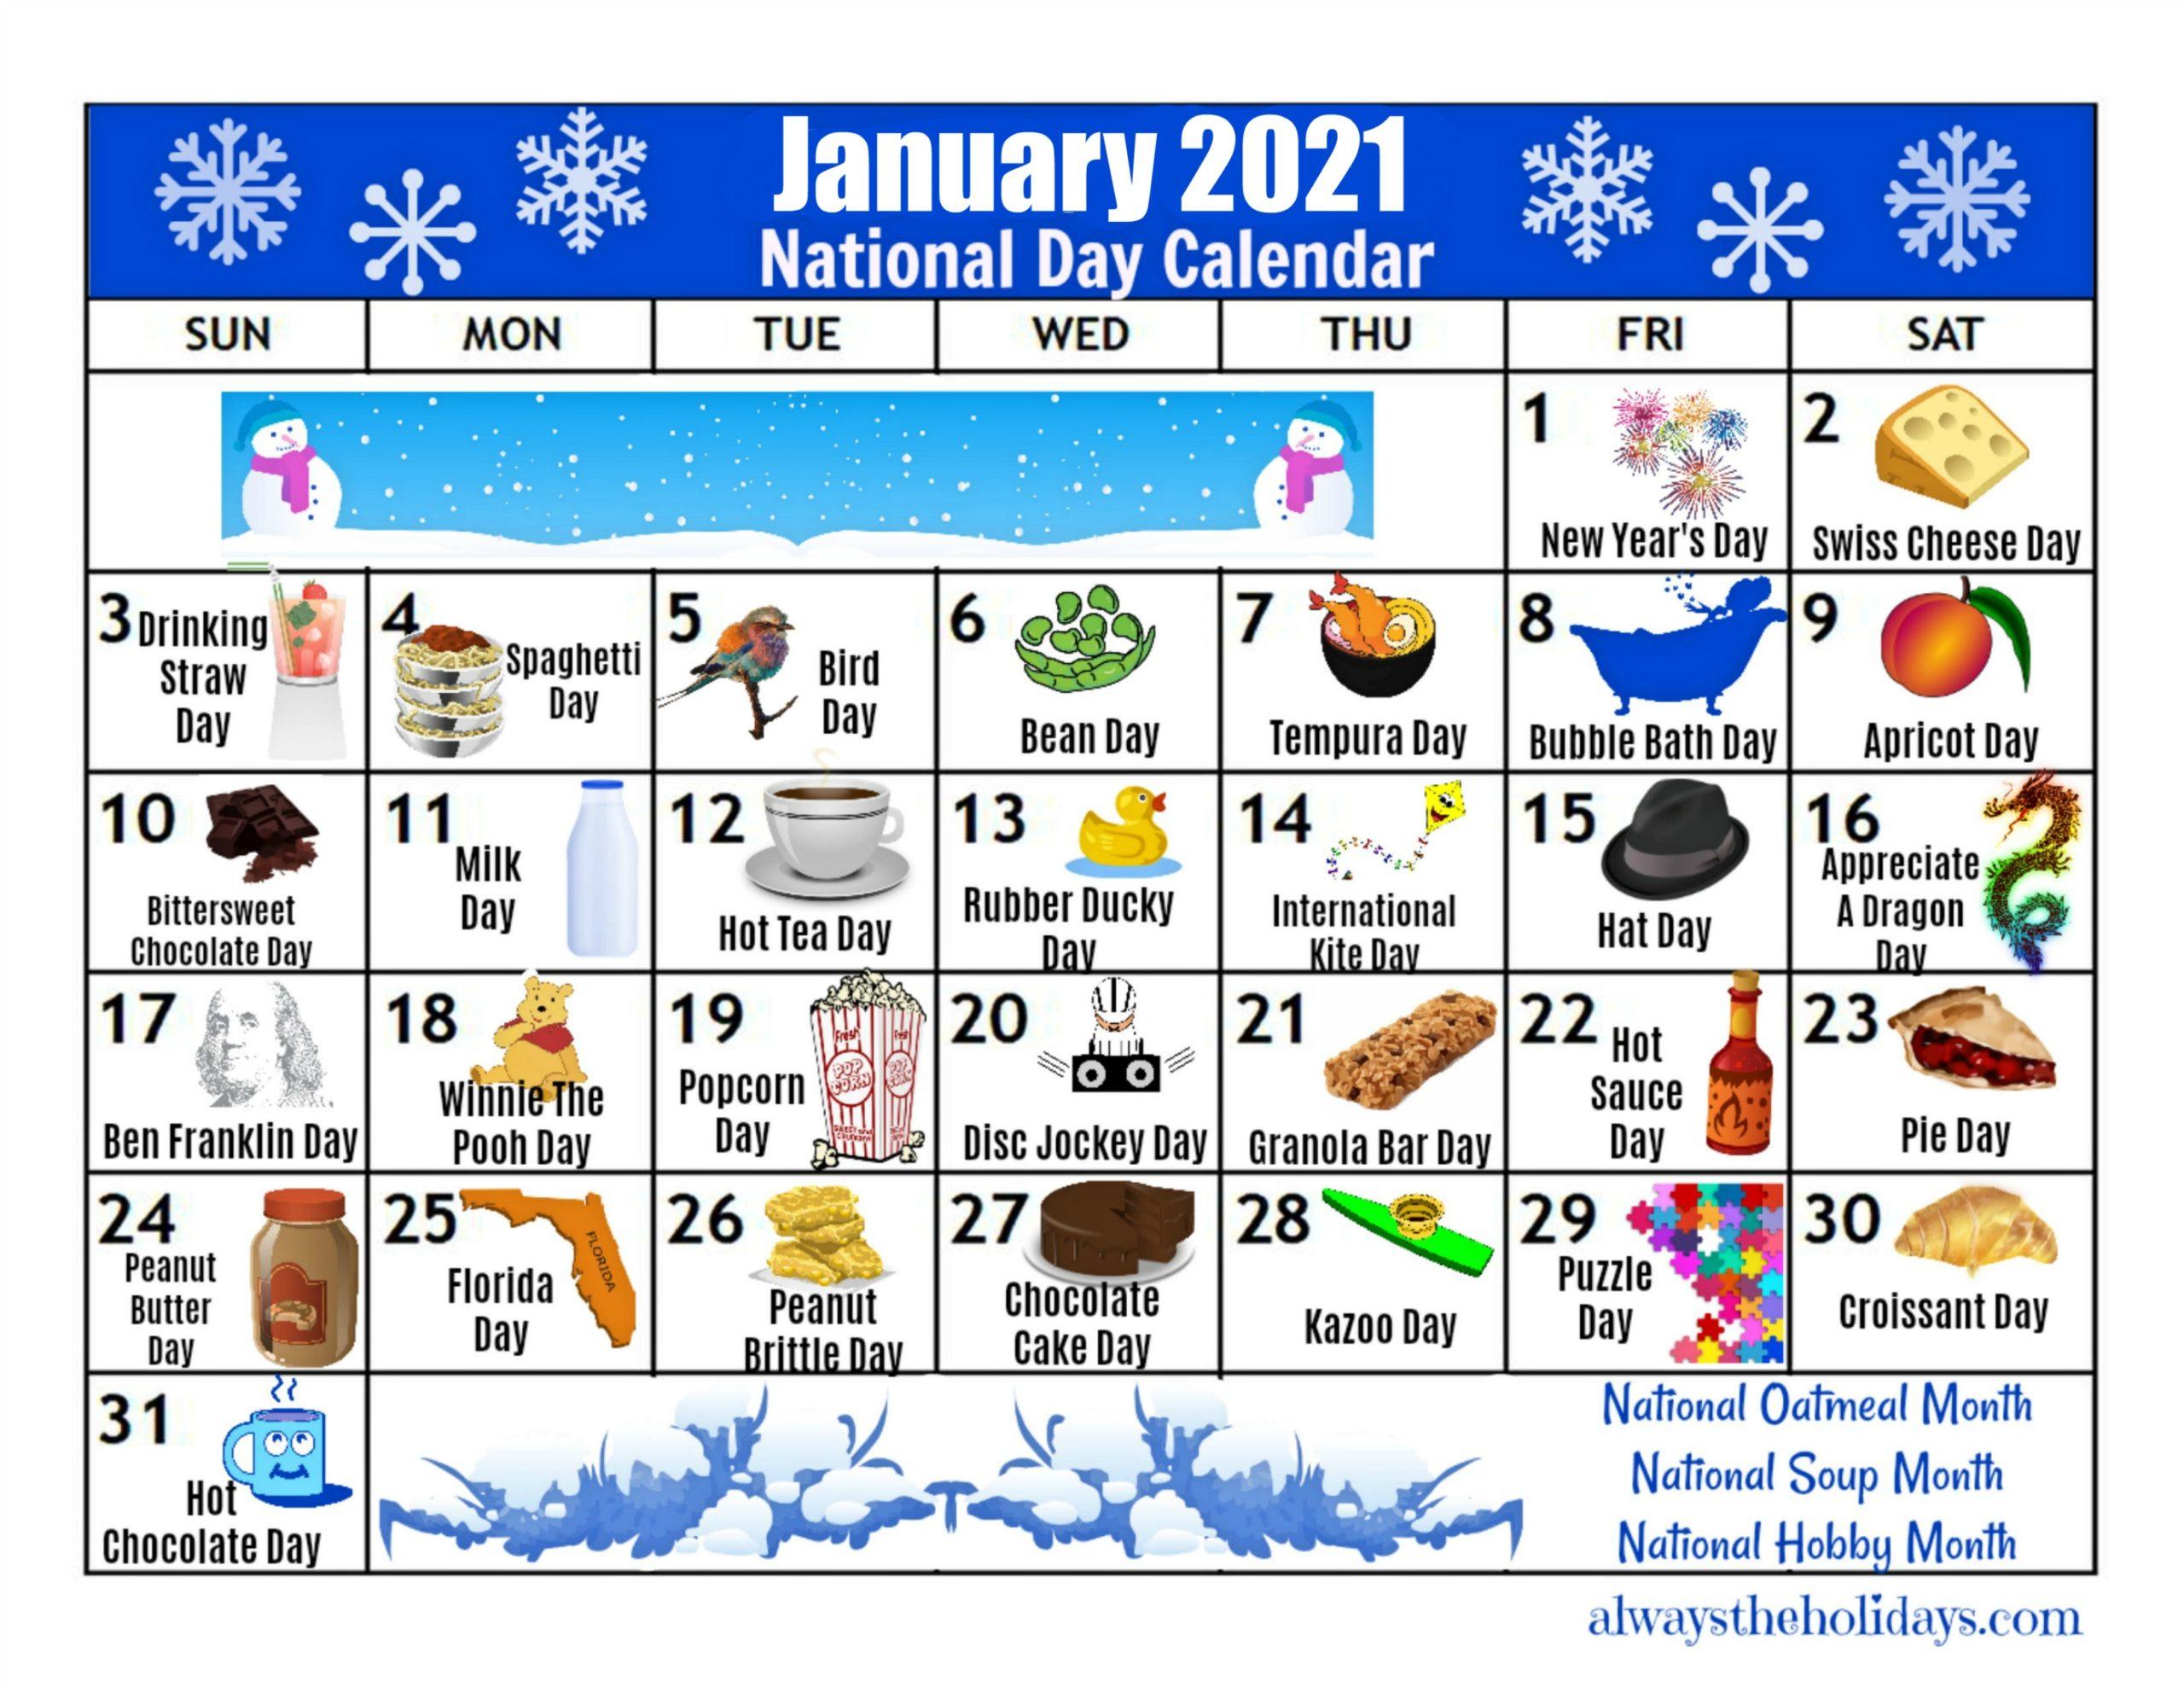 January Printable National Day Calendar 2021 - Free Planning regarding Printable National Day Calendar 2021